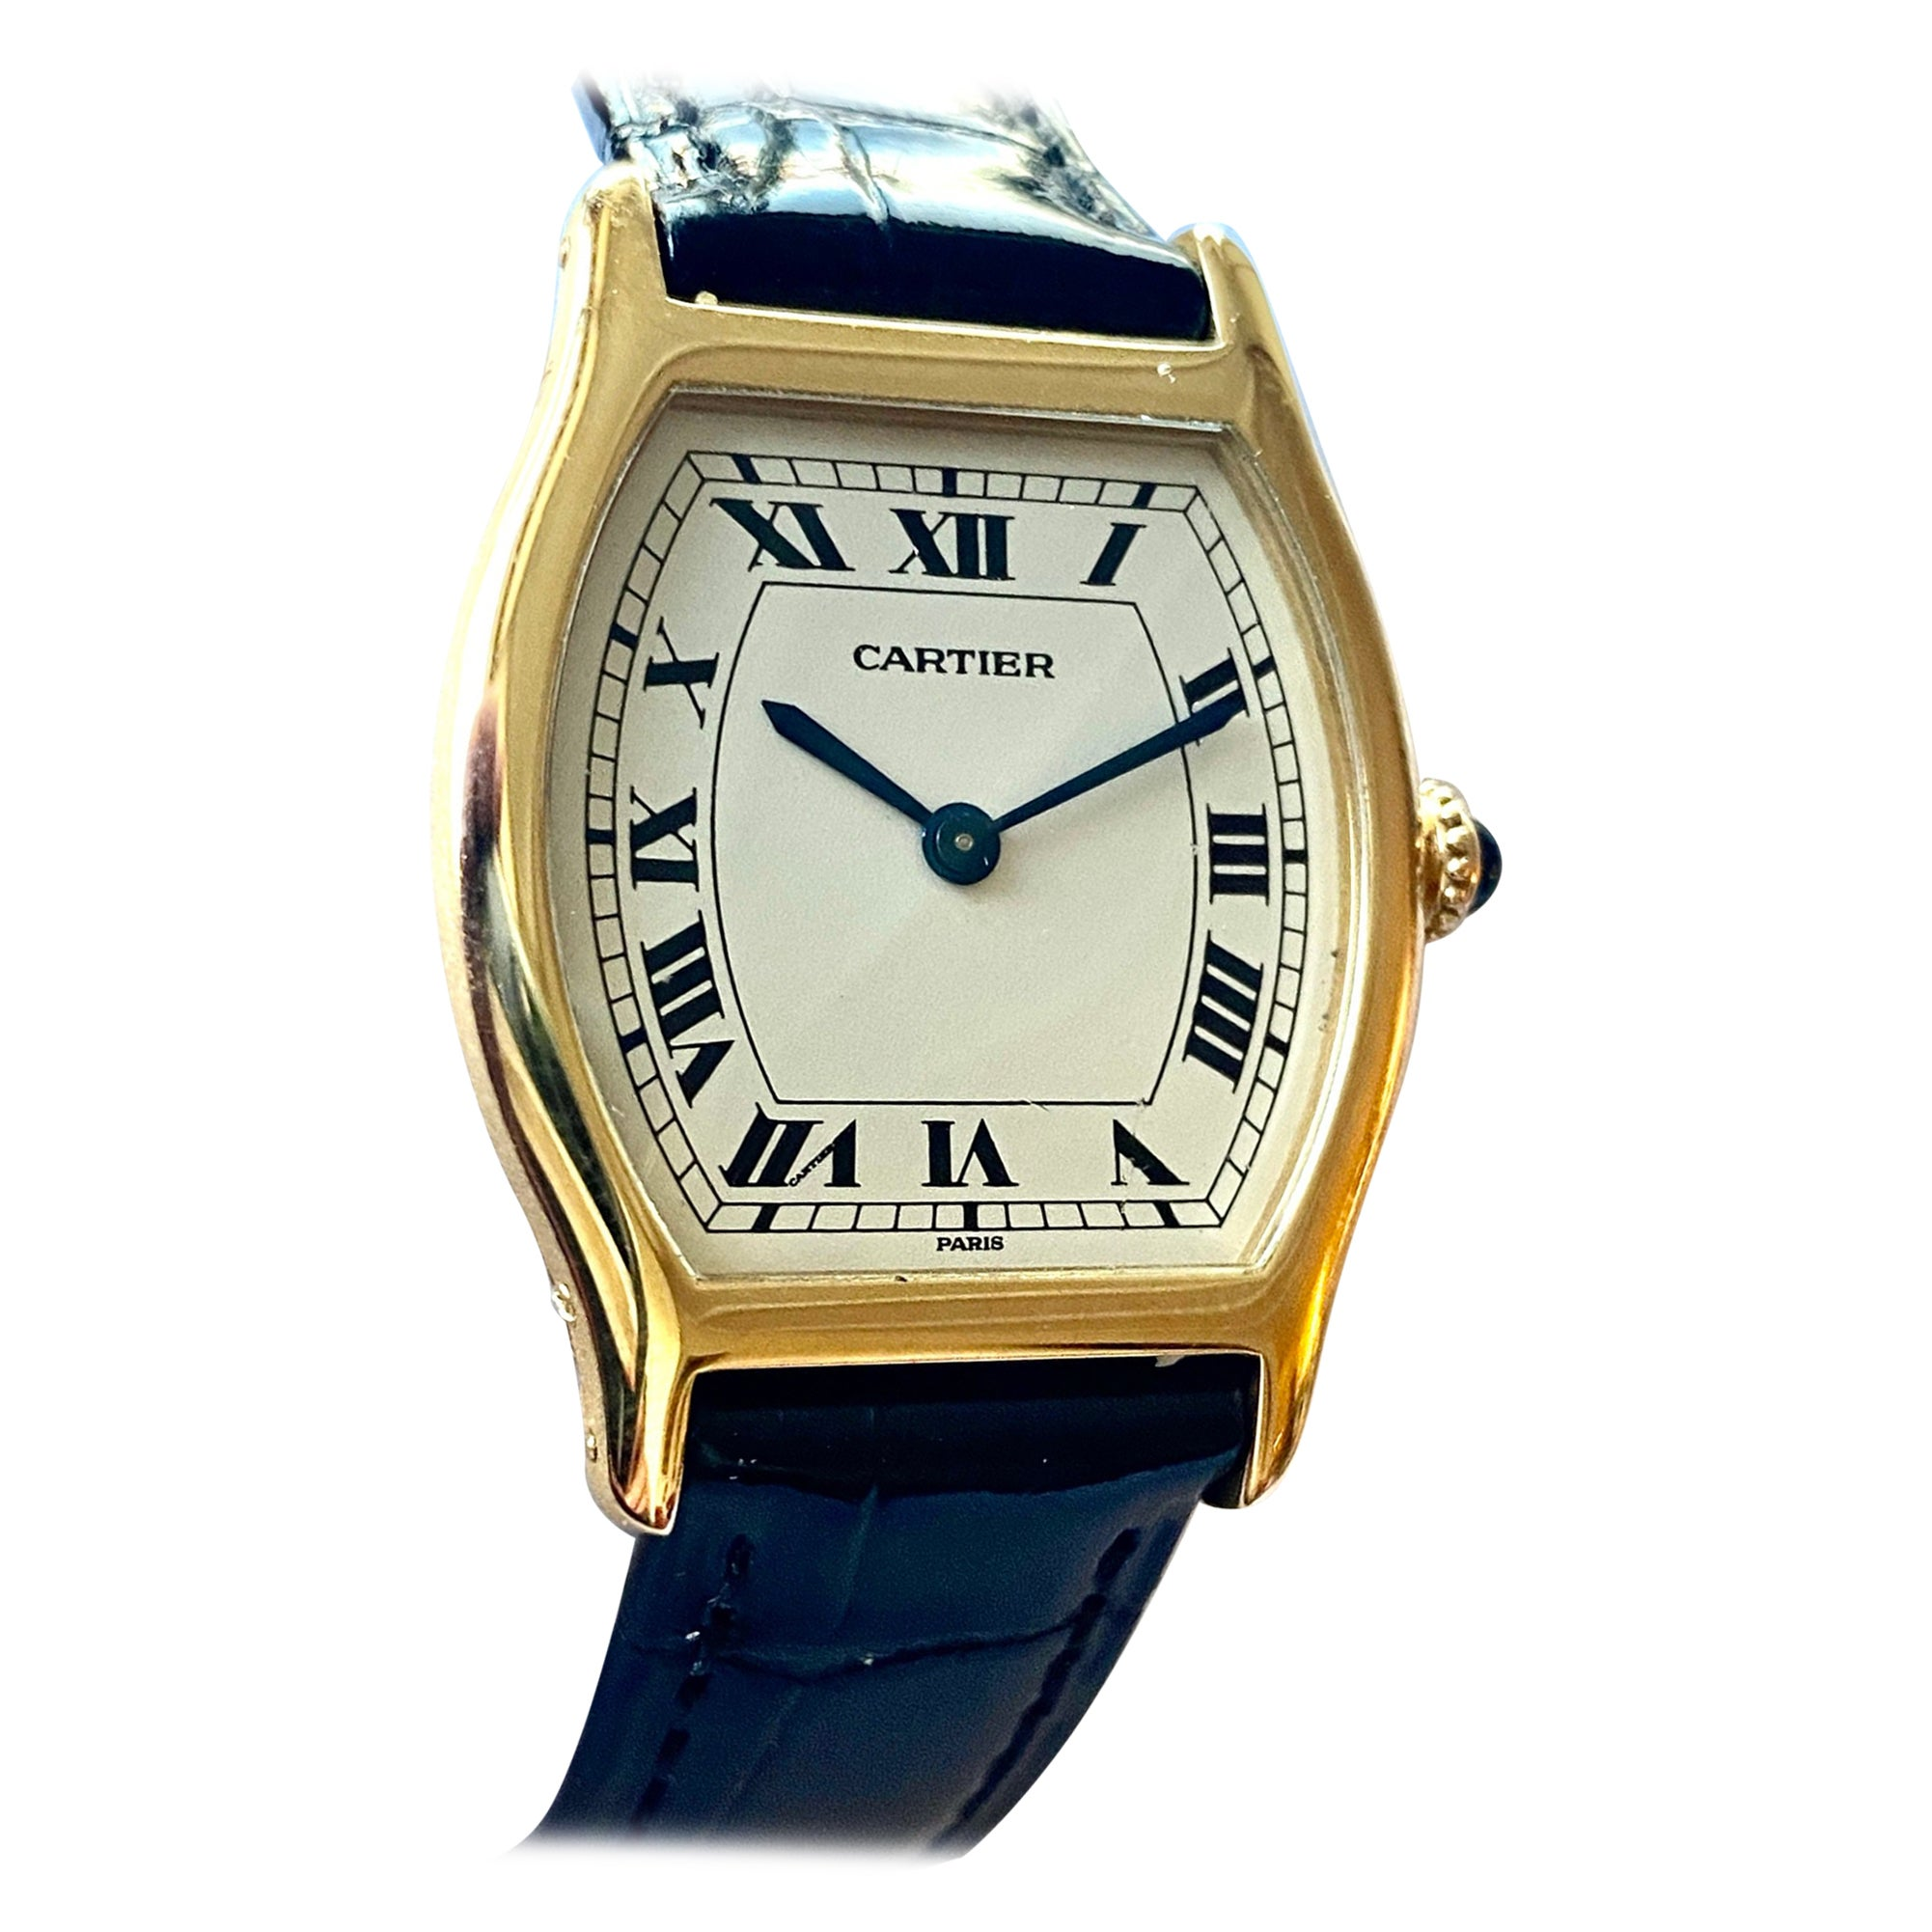 Cartier Paris Yellow Gold Watch, Model: TORTUE, Handwinding 1975 Model Nr 96069